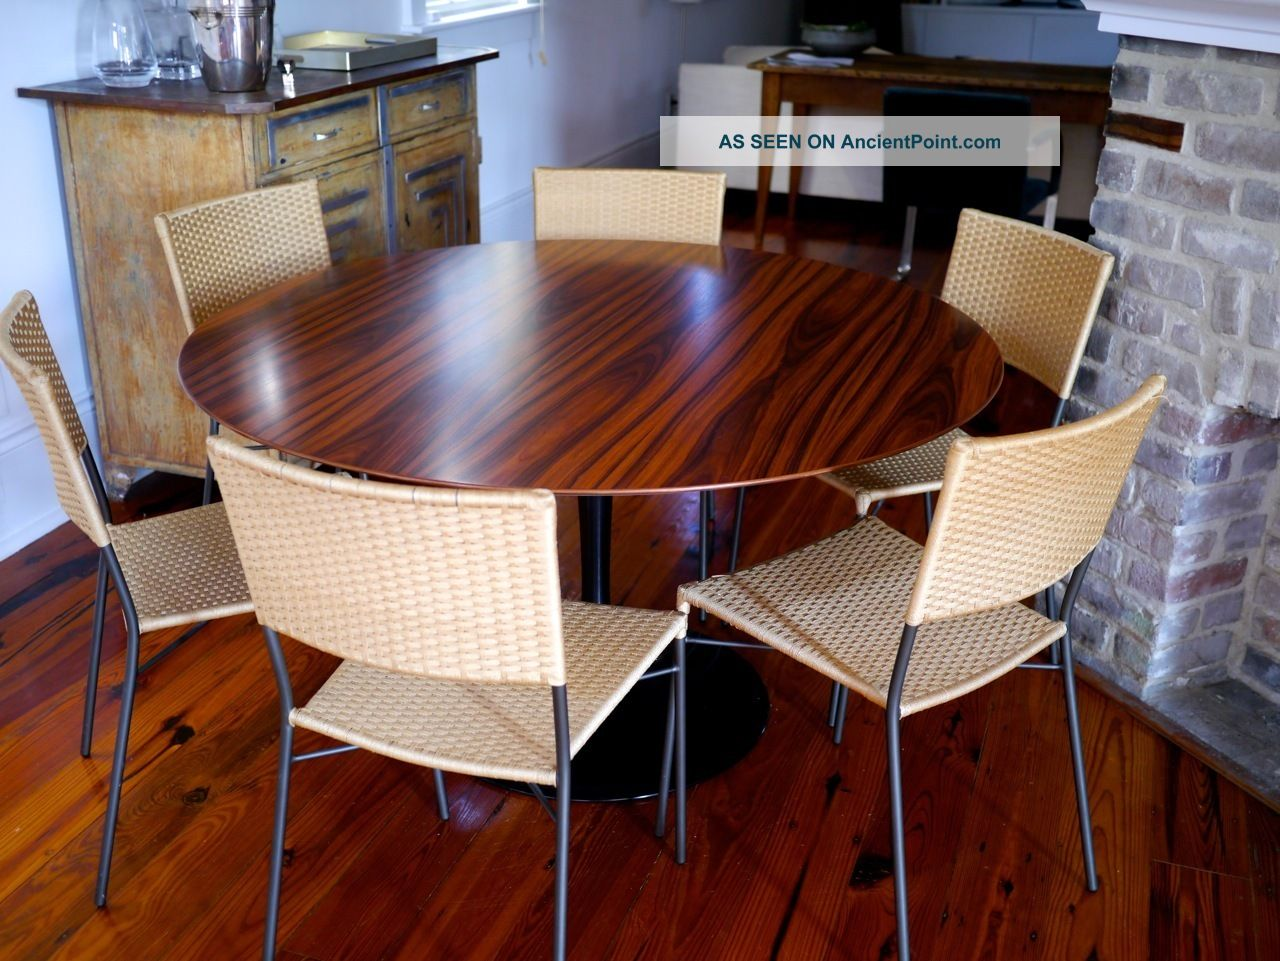 Knoll Authentic Saarinen Dining Table Top Rosewood - 54 saarinen table